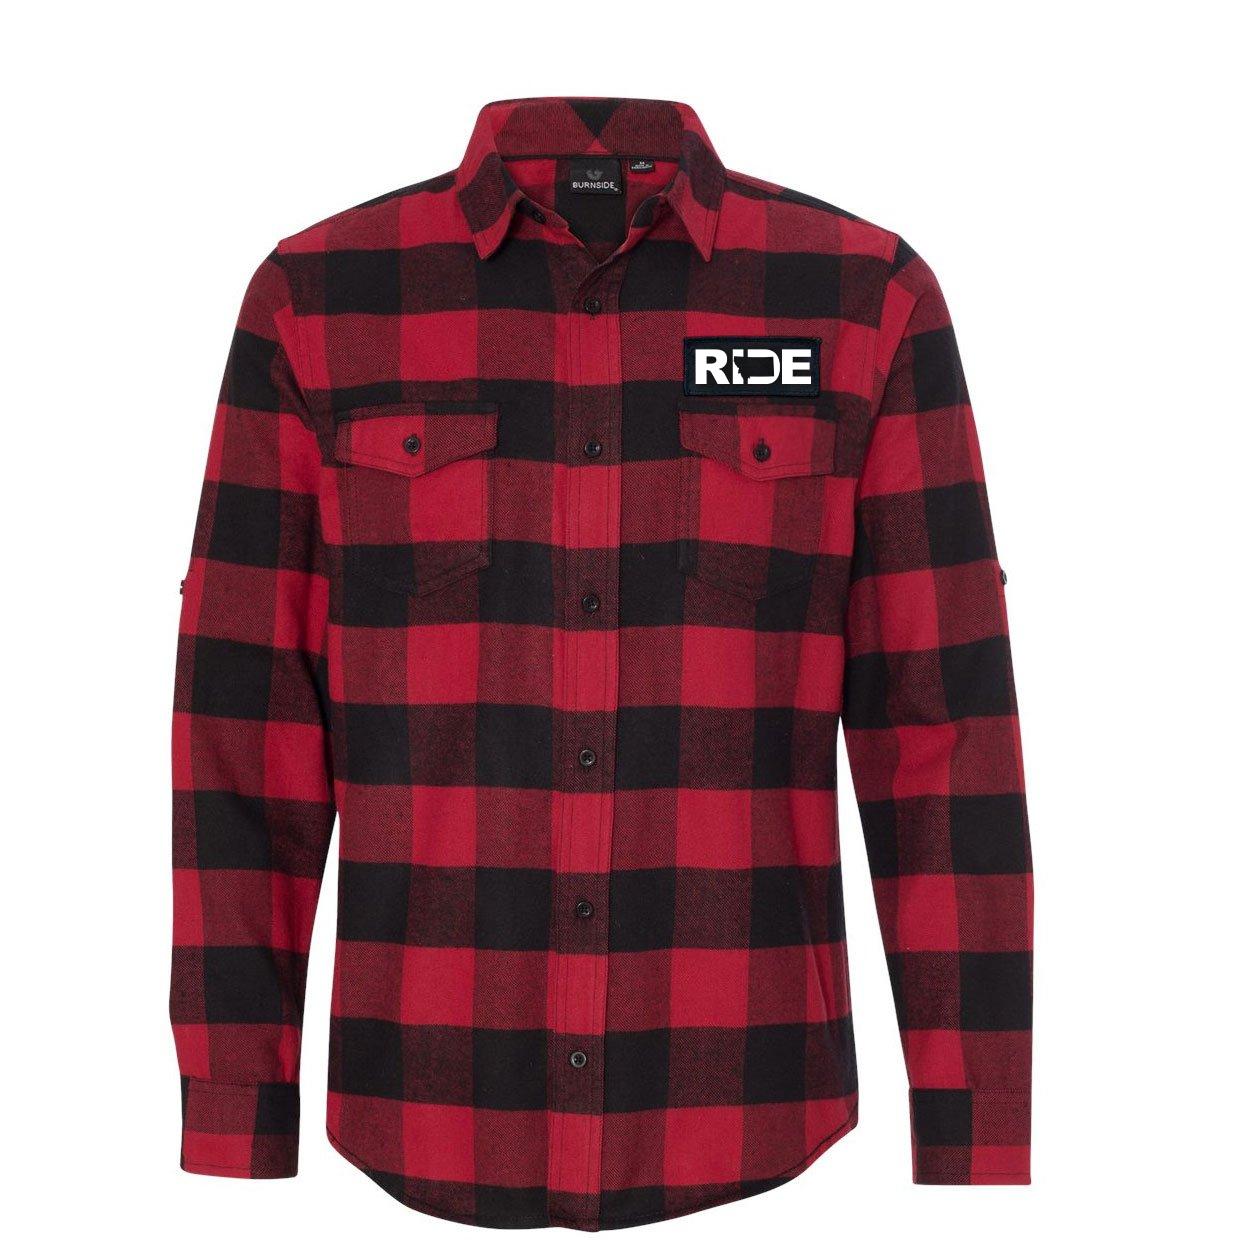 Ride Montana Classic Unisex Long Sleeve Woven Patch Flannel Shirt Red/Black Buffalo (White Logo)